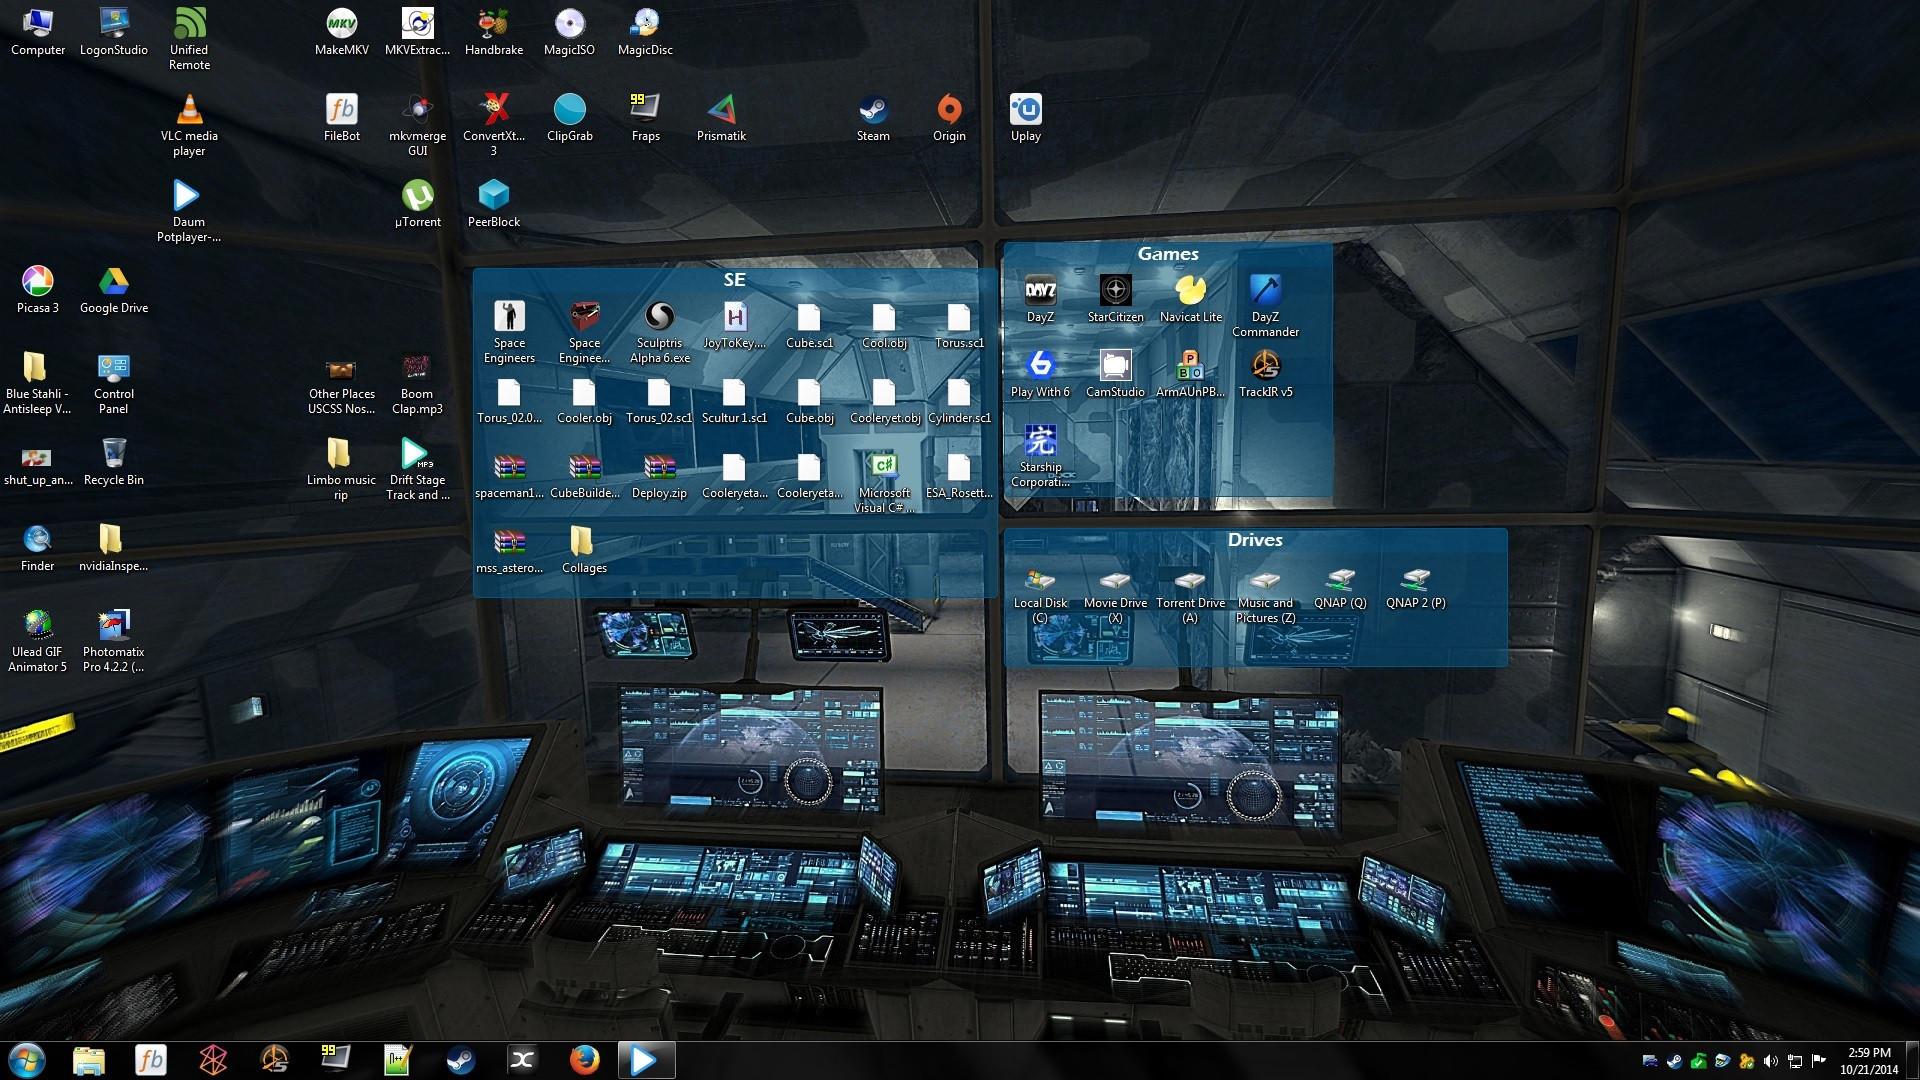 Best Desktop Wallpapers 1080phd Only 1920x1080